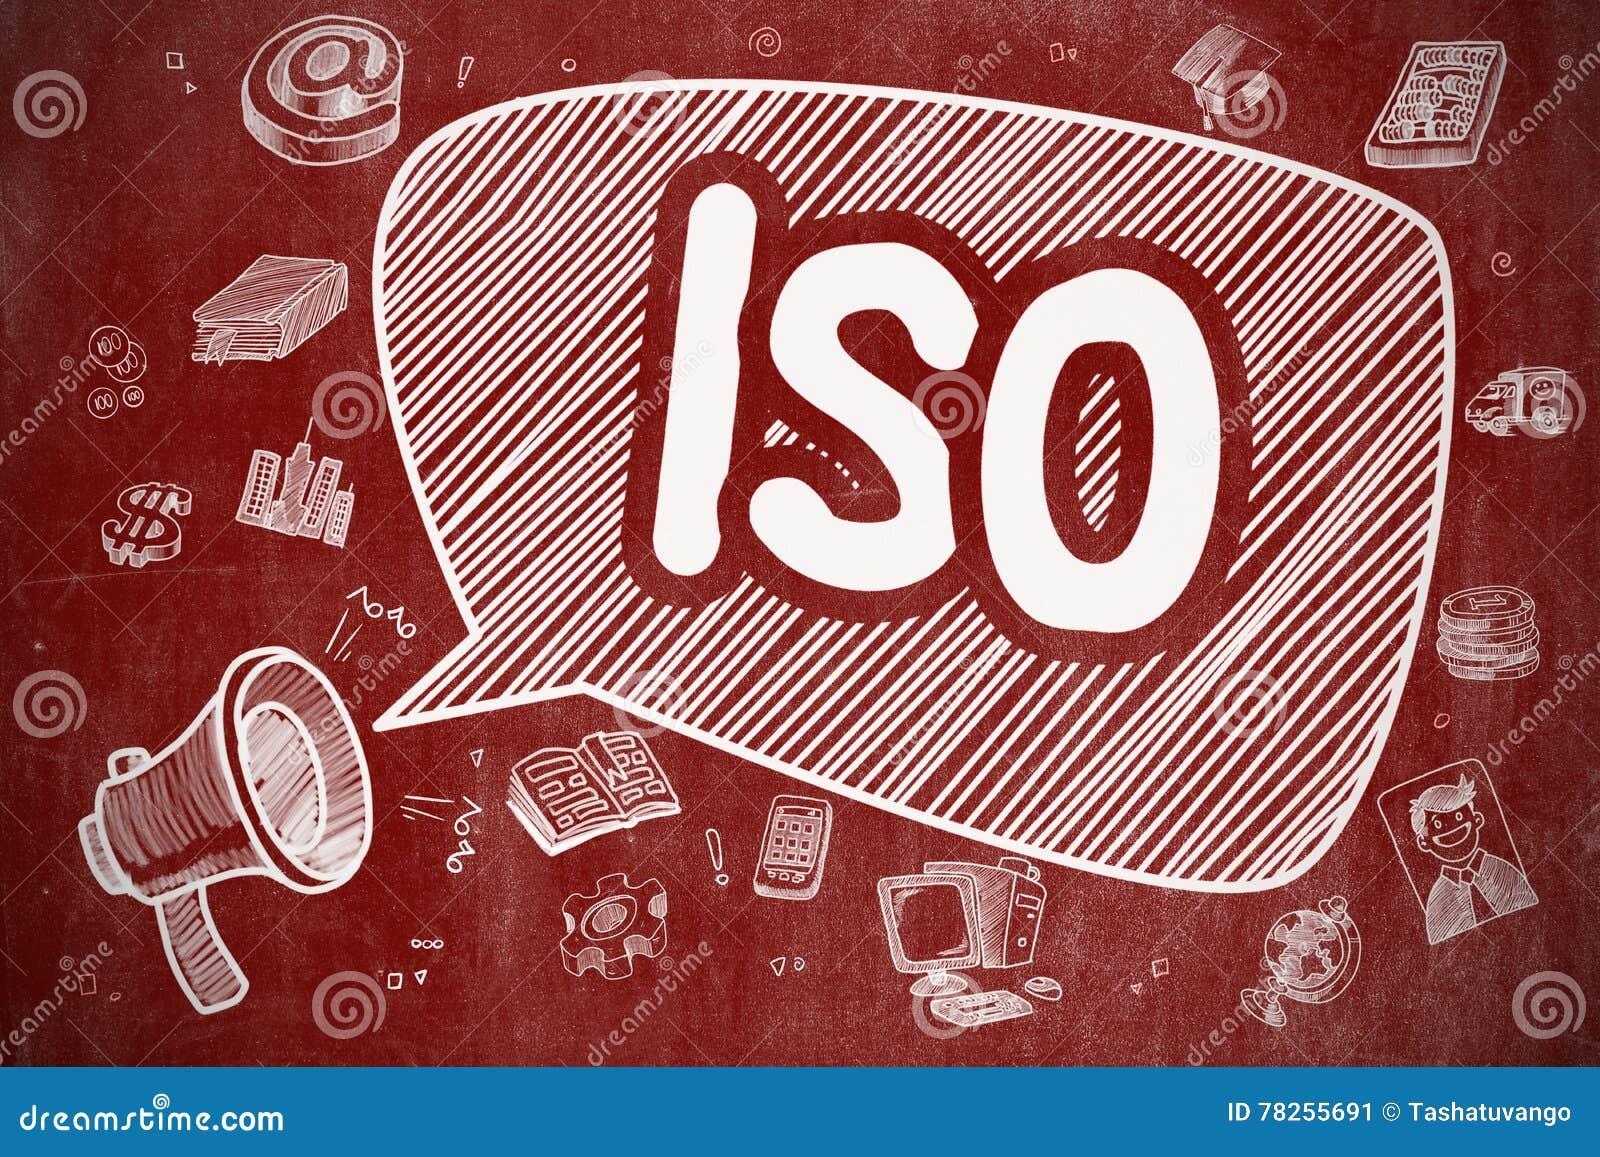 ISO - Απεικόνιση κινούμενων σχεδίων στον κόκκινο πίνακα κιμωλίας